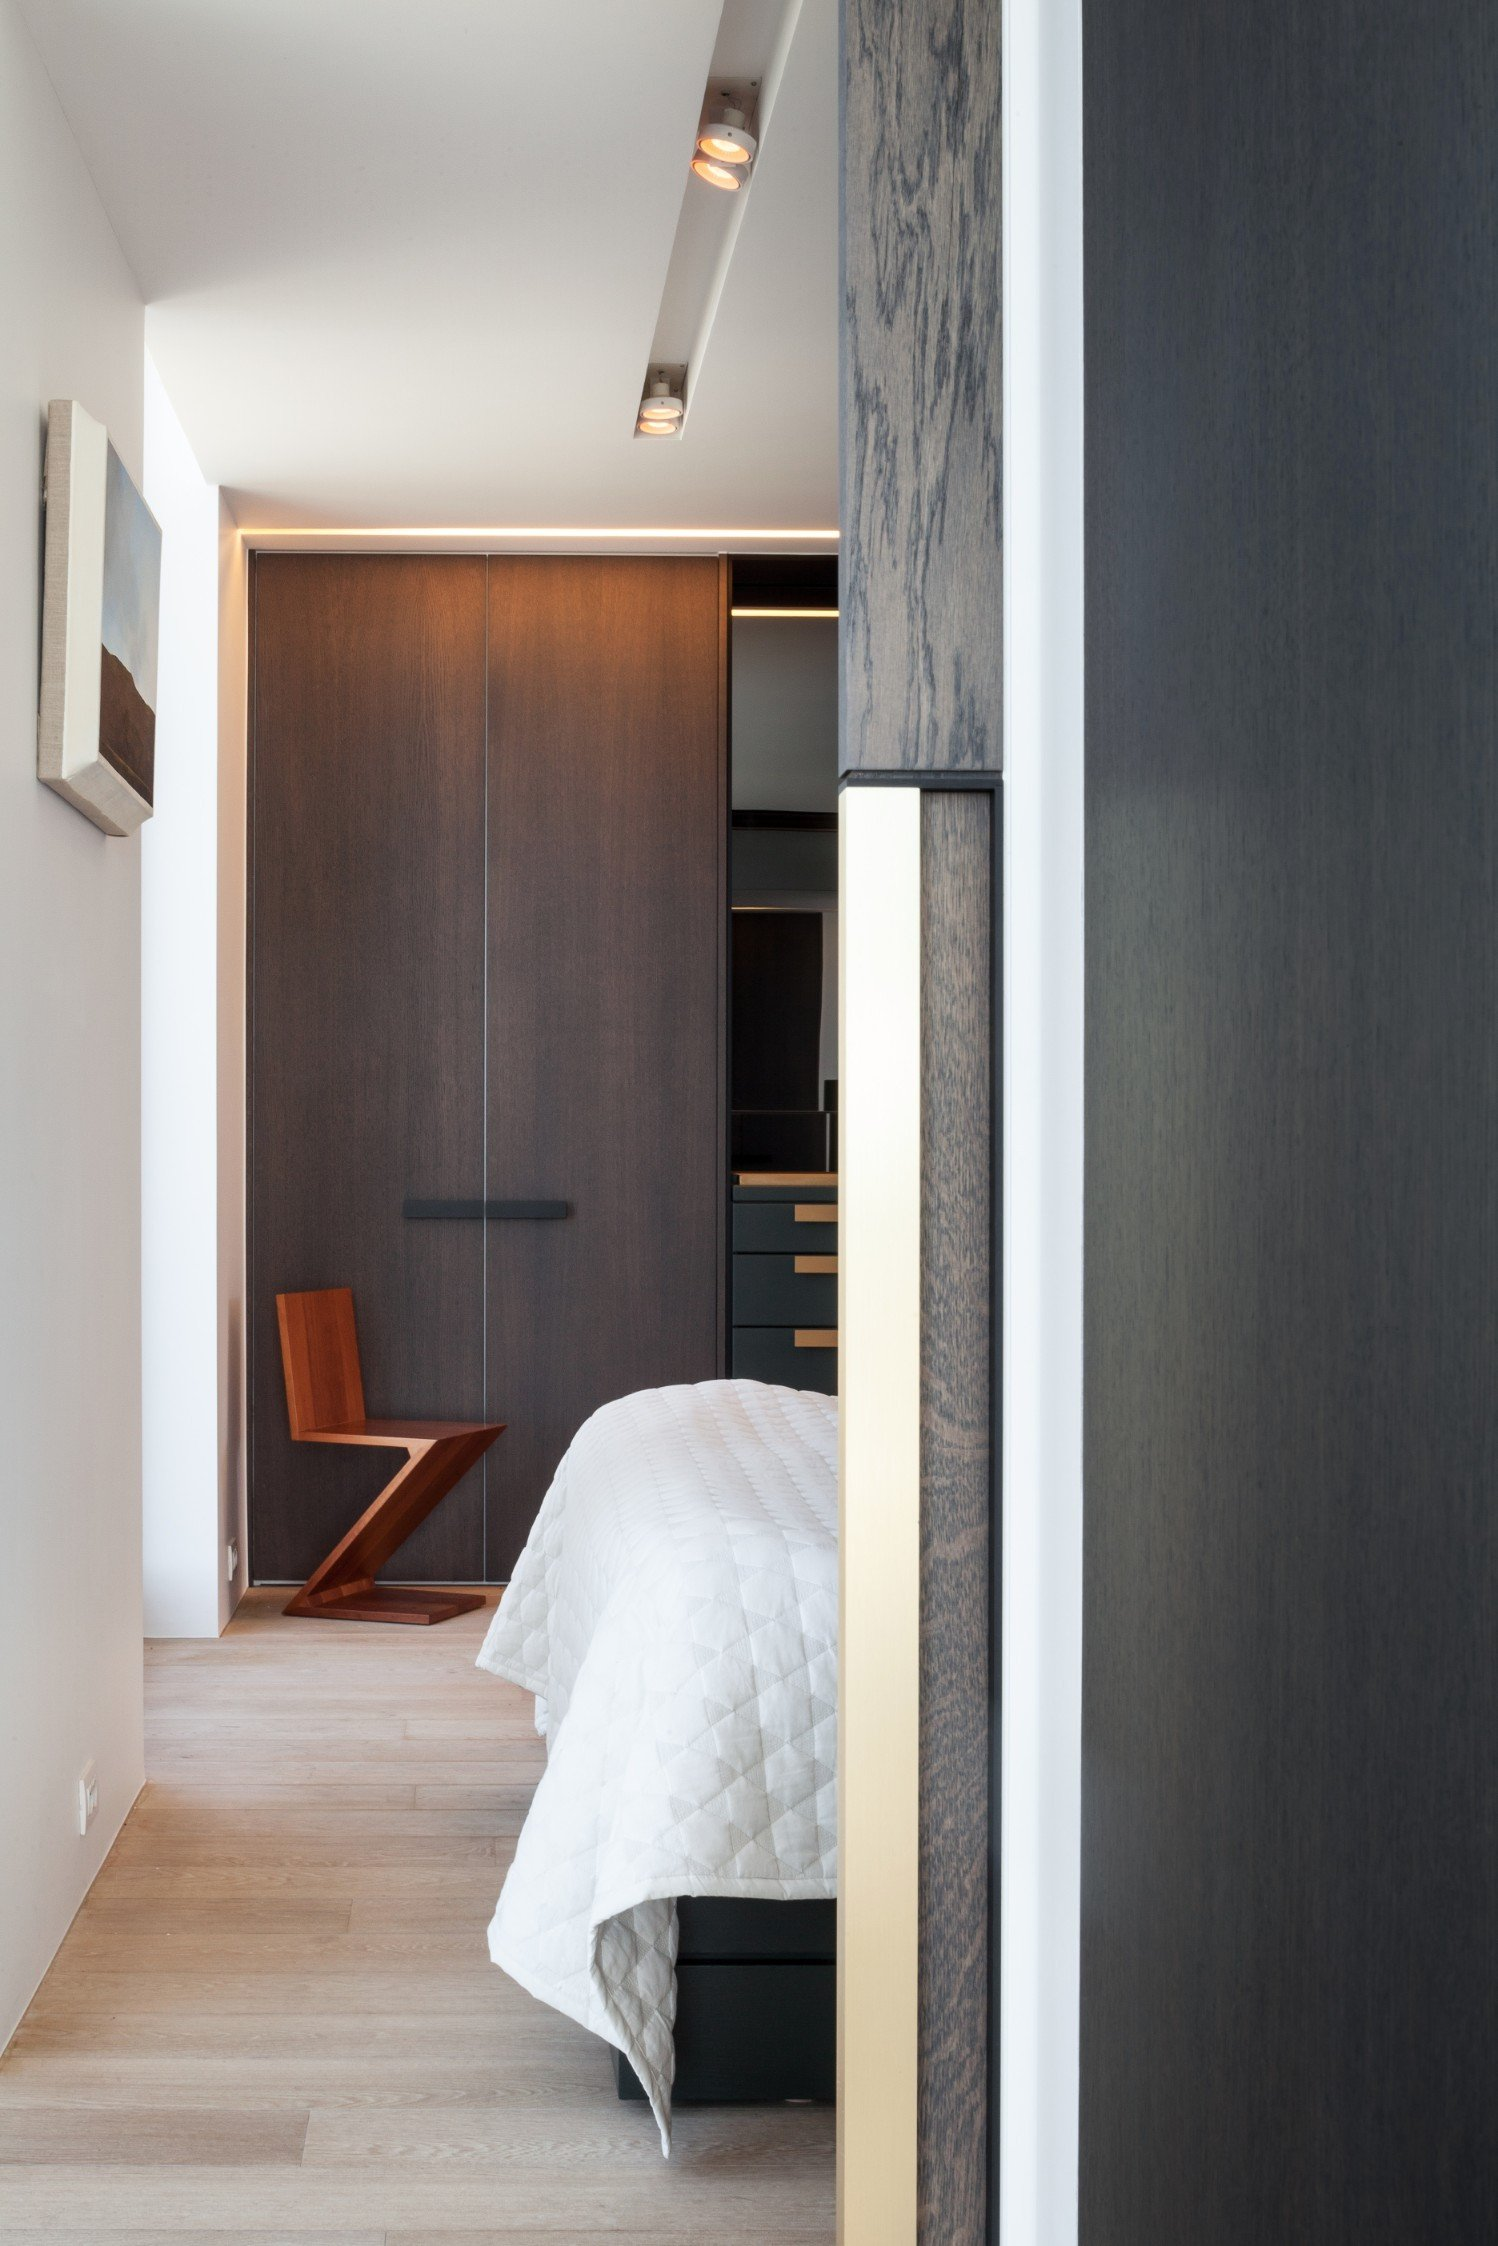 Rietveldprojects-penthouse-appartement-design-architectuur-kust4